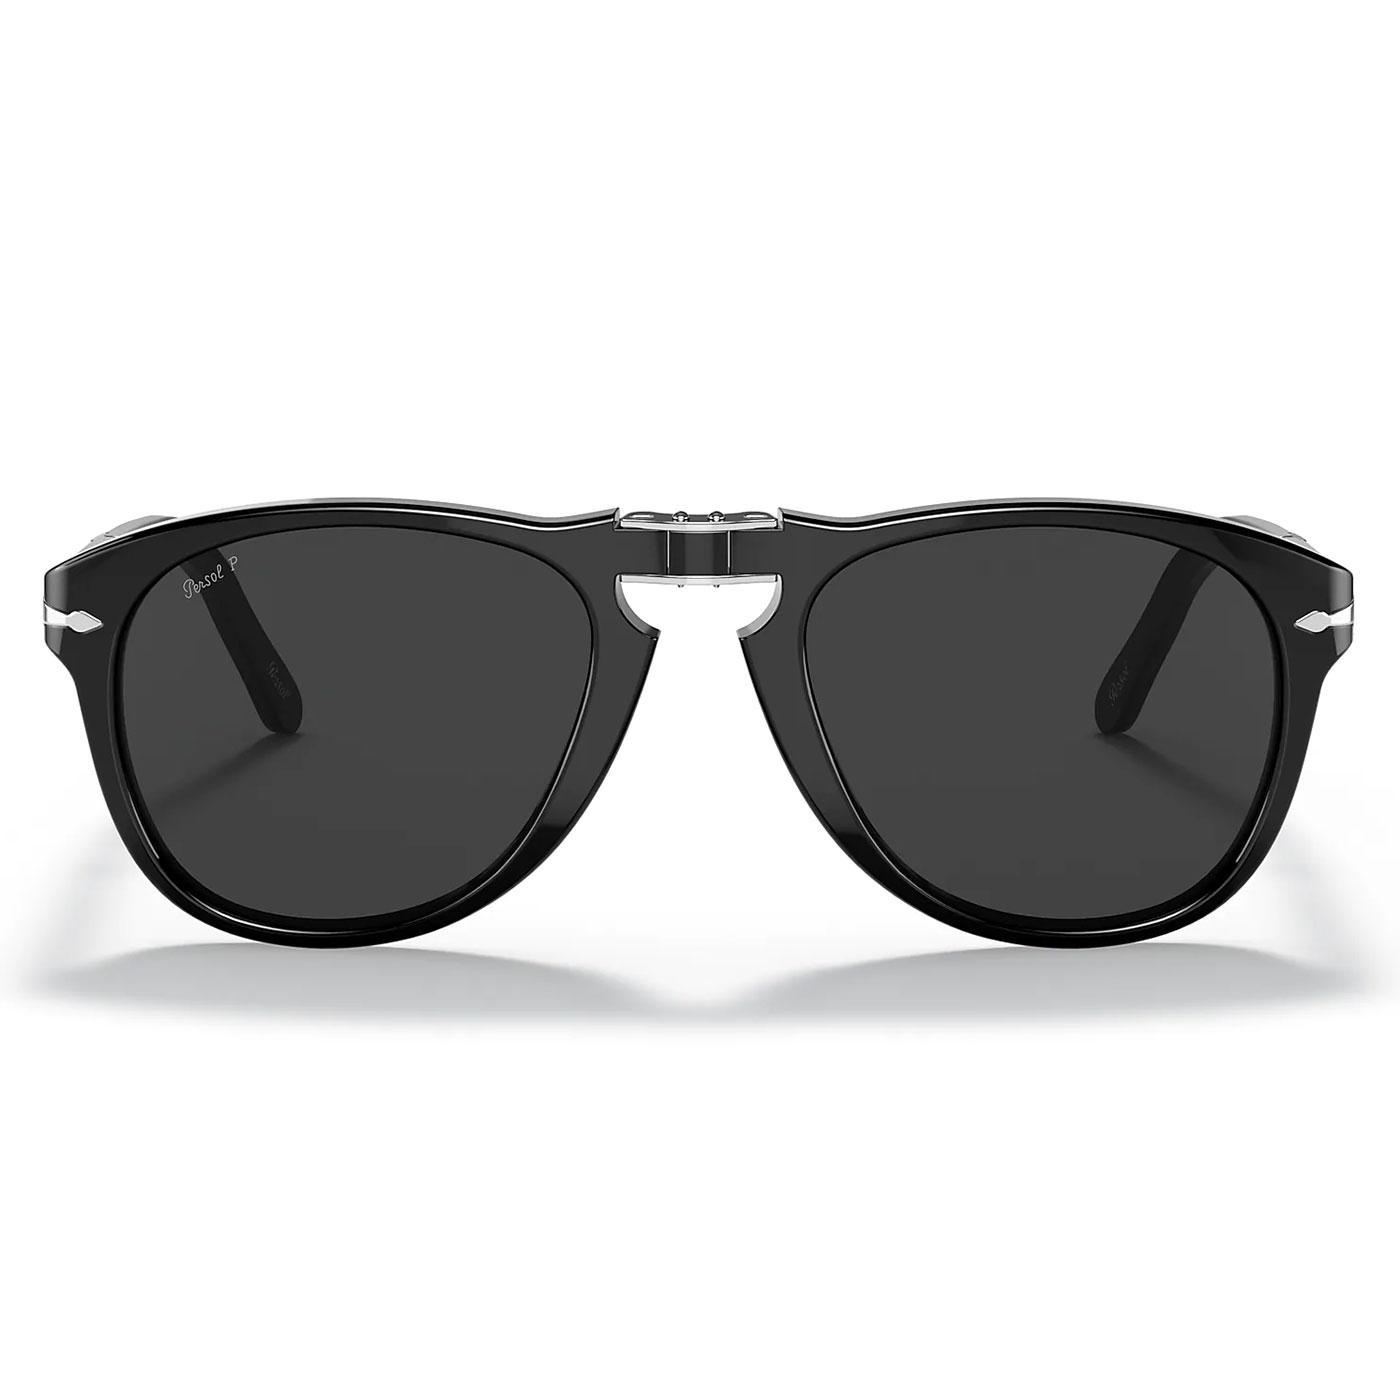 PERSOL Steve McQueen 714SM Sunglasses (Black)